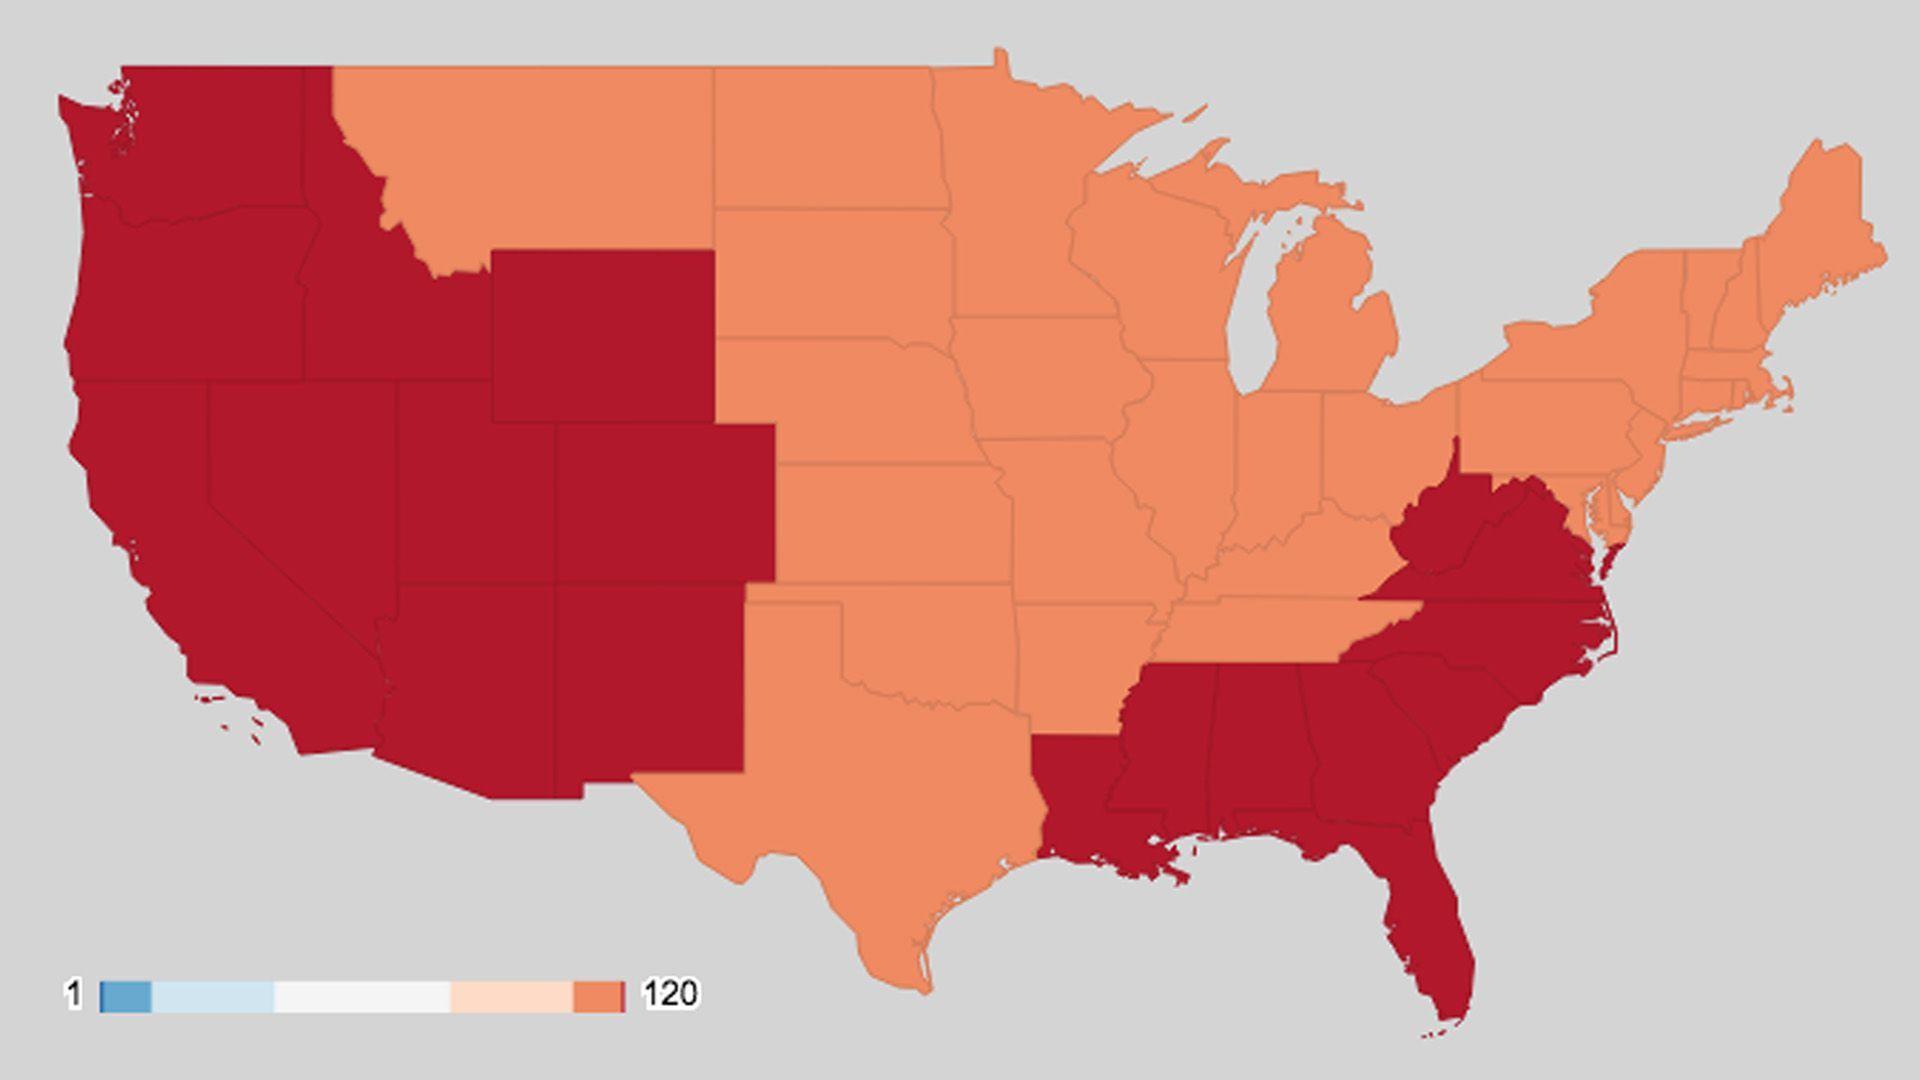 Map showing U.S. temperature records